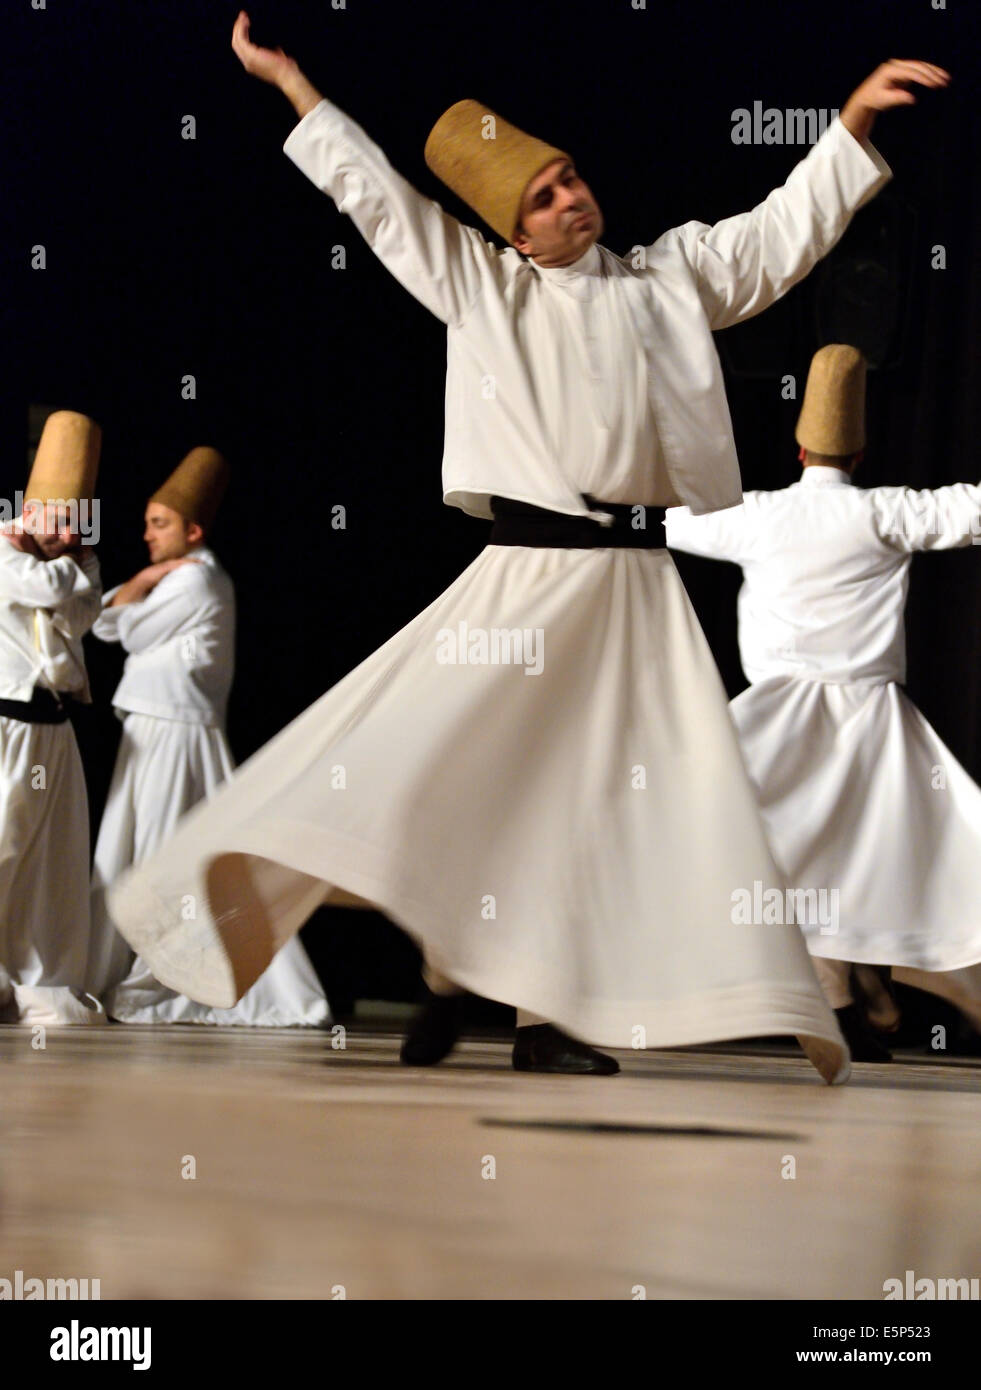 ISTANBUL, TURKEY - DECEMBER 14: Sufi whirling dervish (Semazen) dances, Commemoration of Mevlana Jalaluddin Rumi - Stock Image